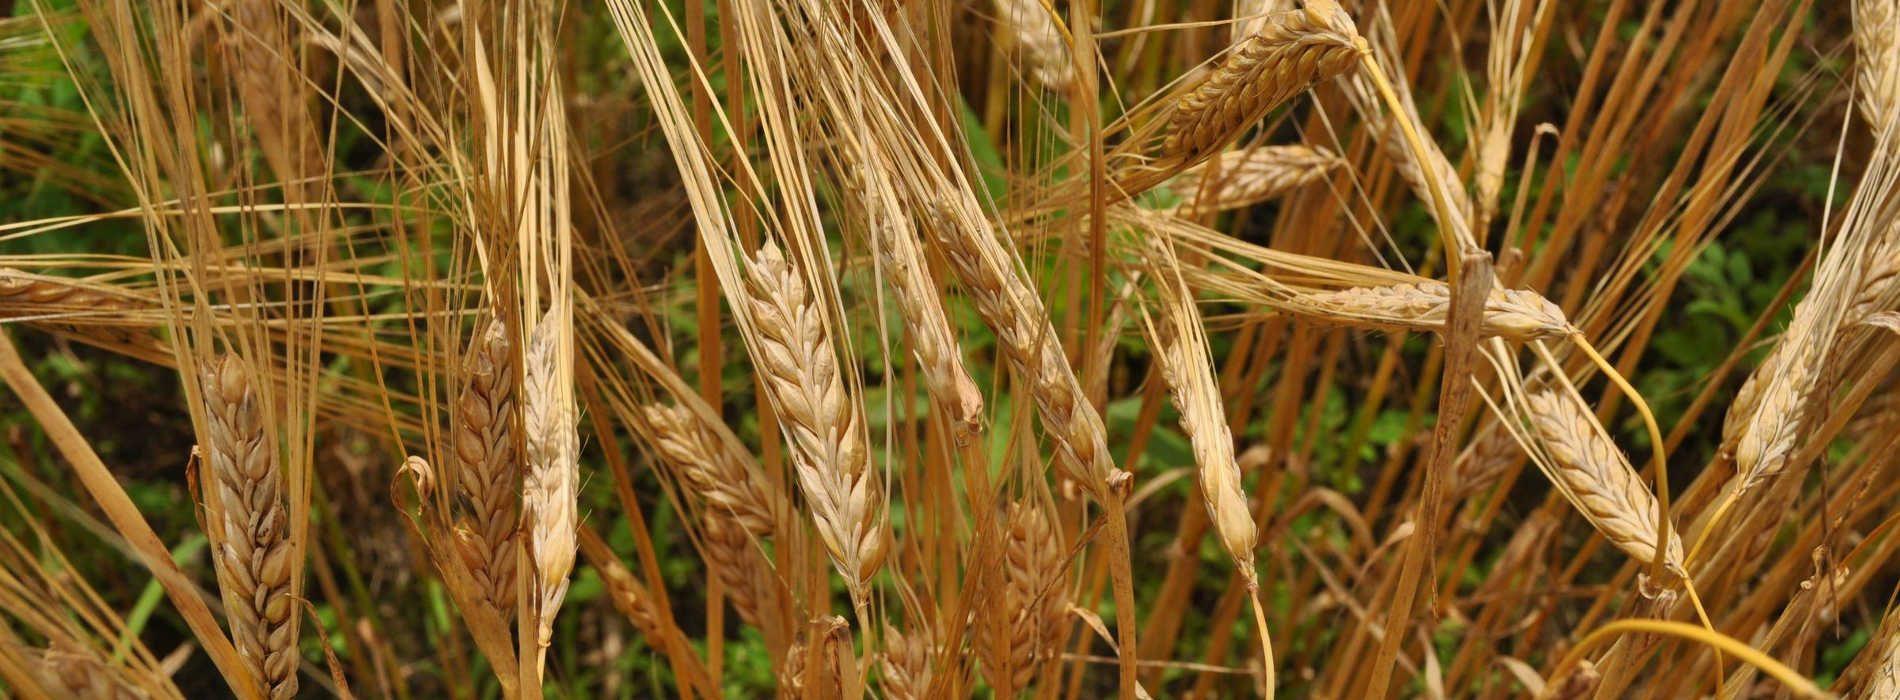 Zambian Breweries supports barley farmers